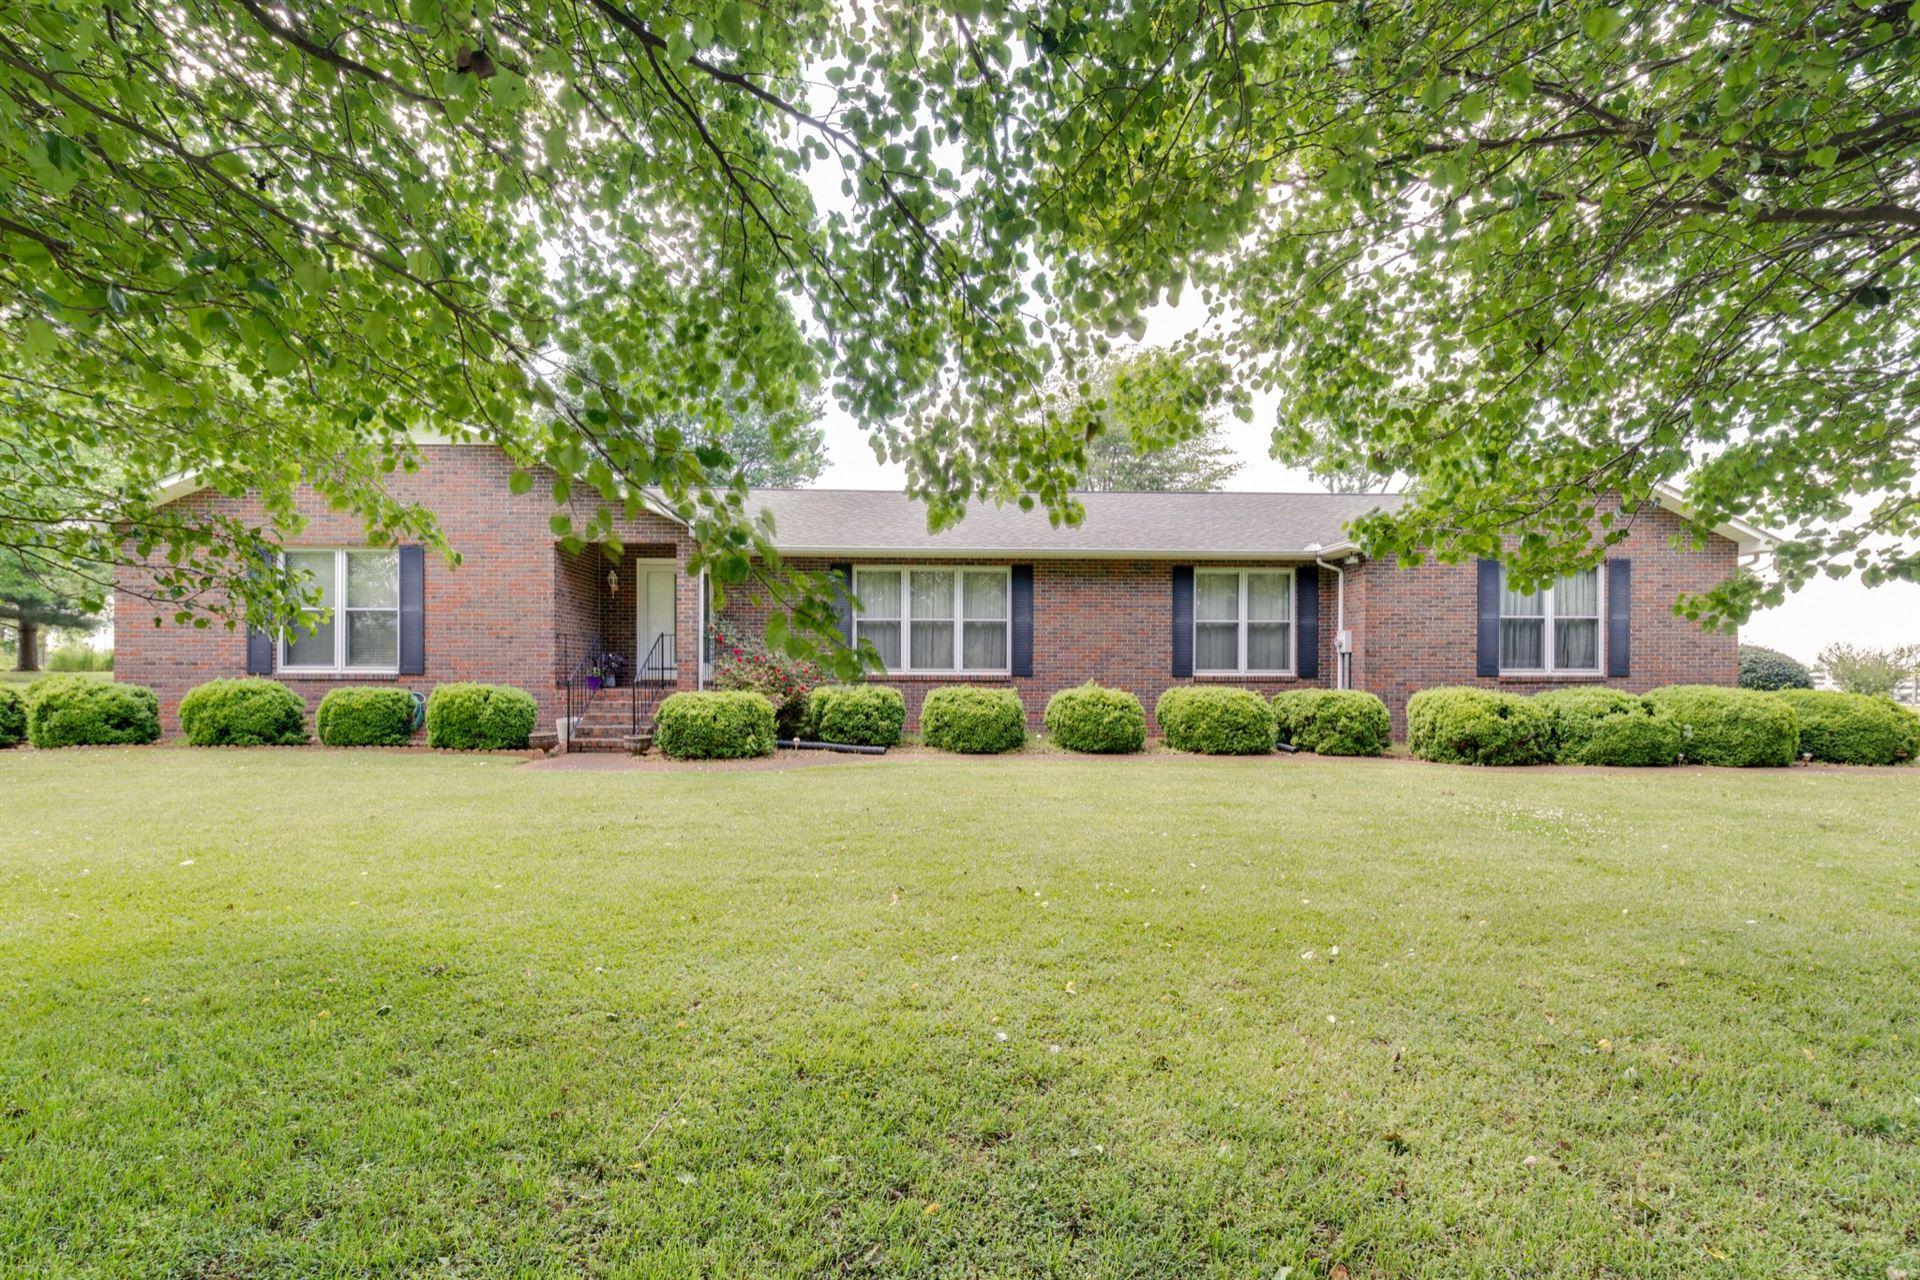 Photo of 101 Farris Rd, Winchester, TN 37398 (MLS # 2250876)